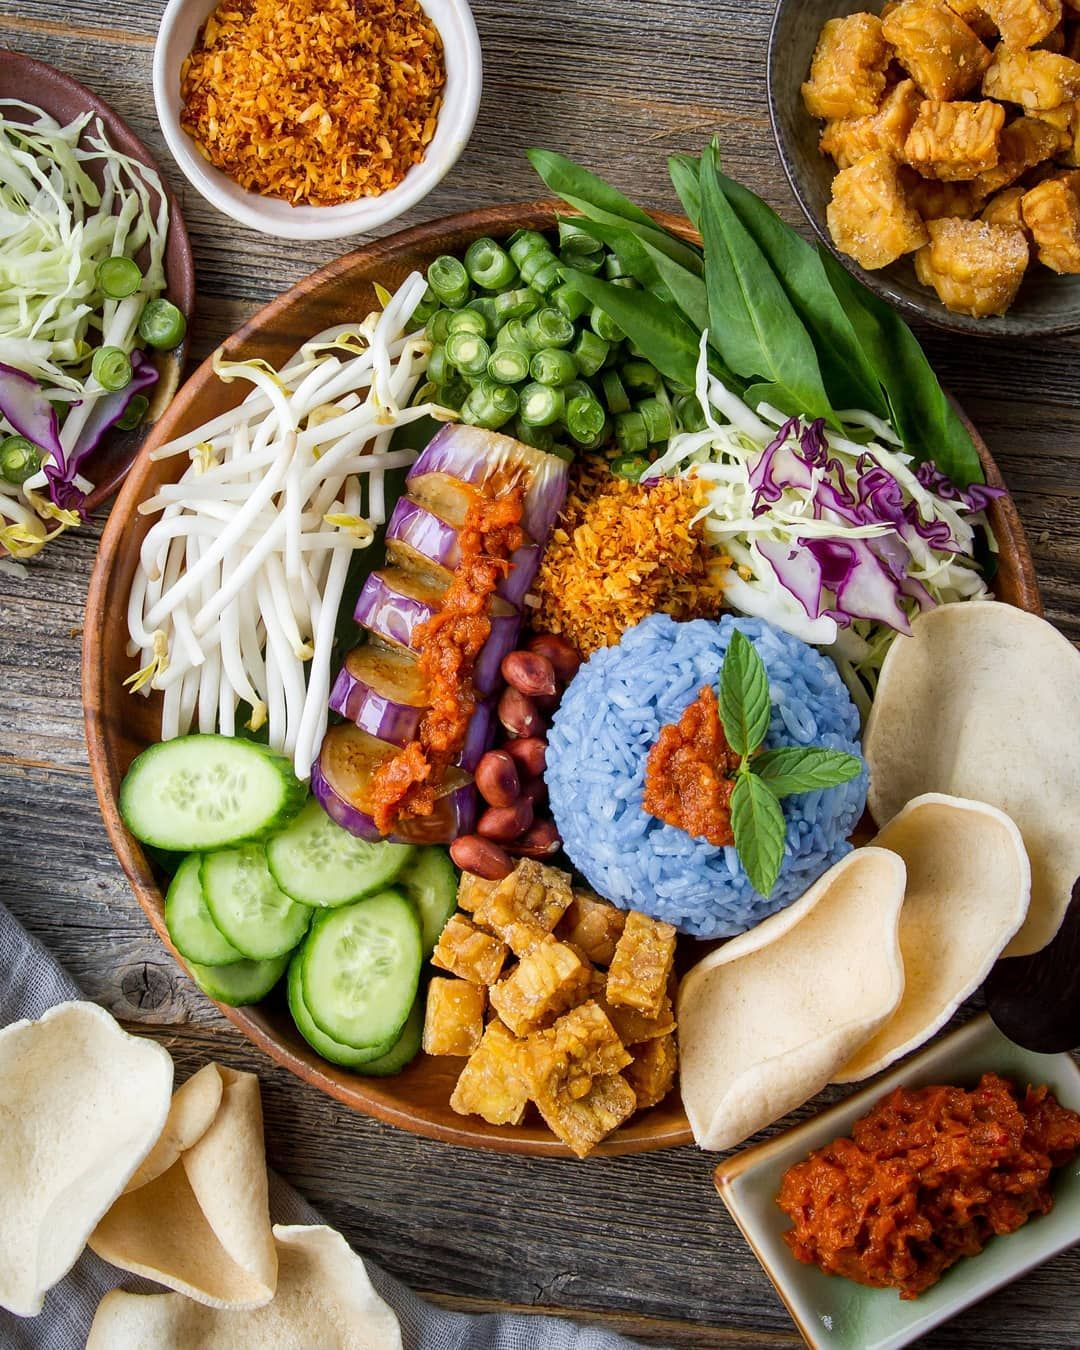 Woonheng On Instagram Nasi Kerabu A Traditional Malay Rice Dish Happy Weekend Friends Nasi Nasi Kerabu Rice Dishes Easy Stovetop Chili Recipe